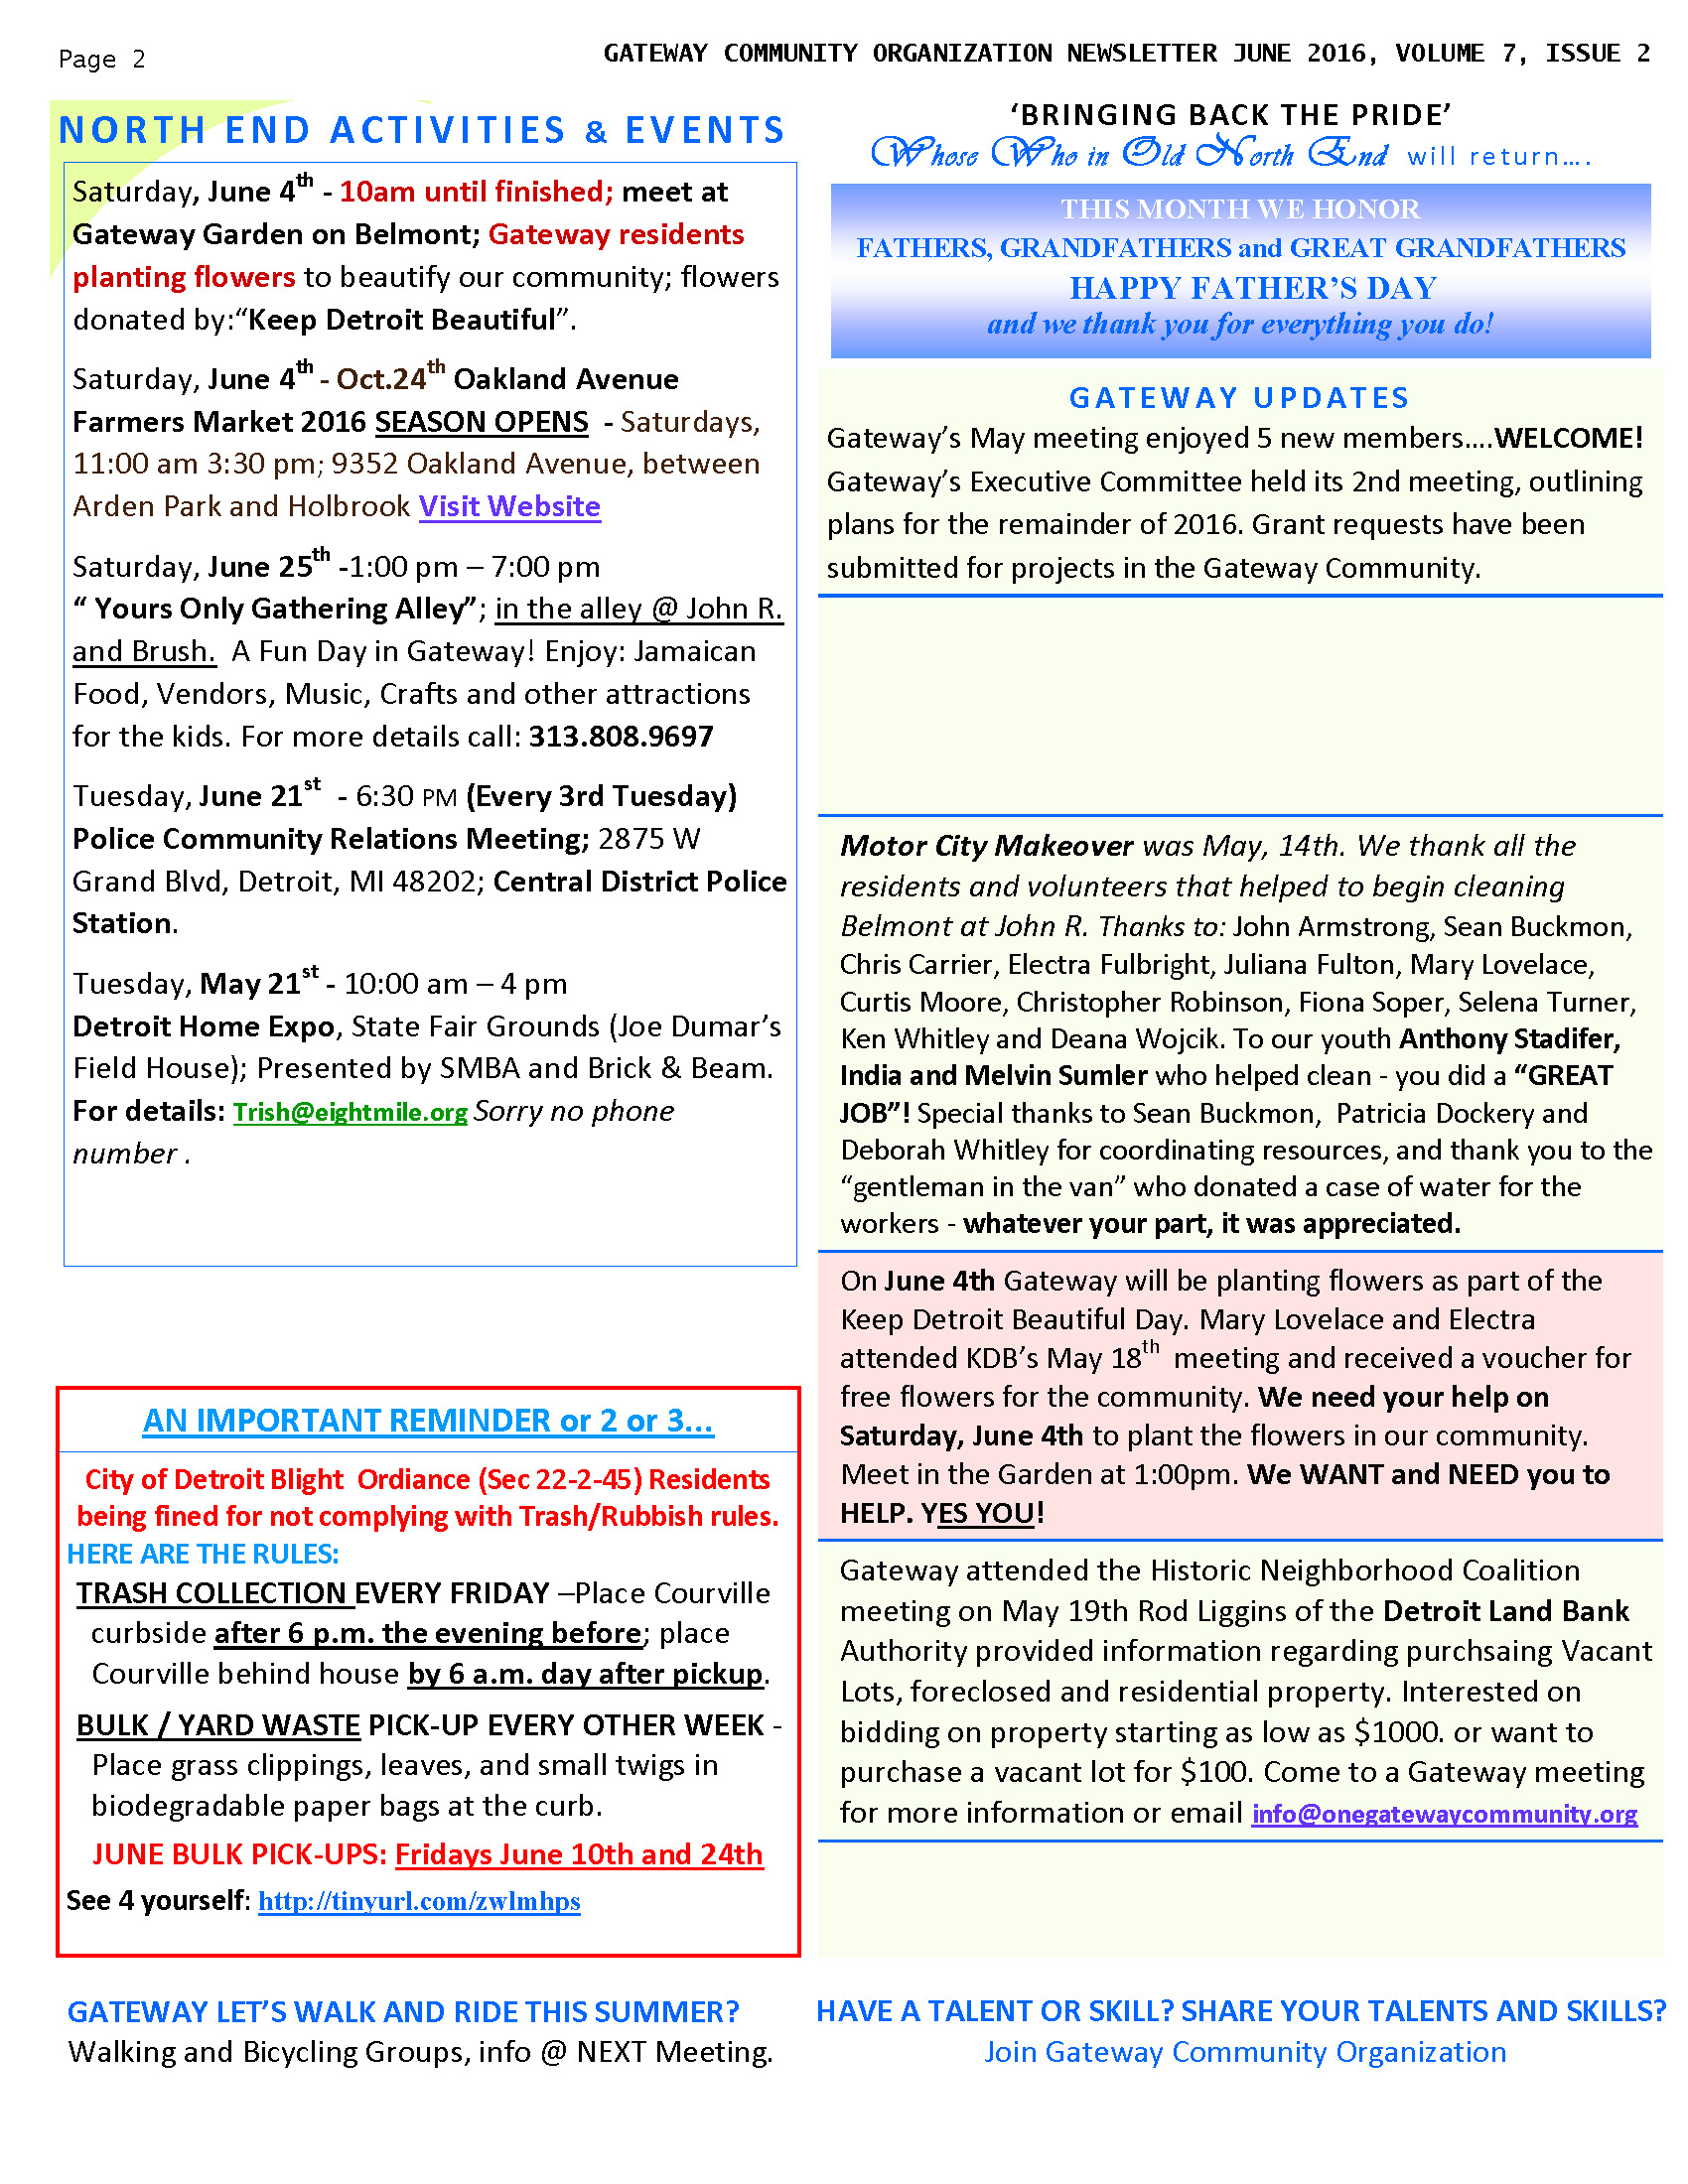 06 2016 Gateway Newsletter_Page_2